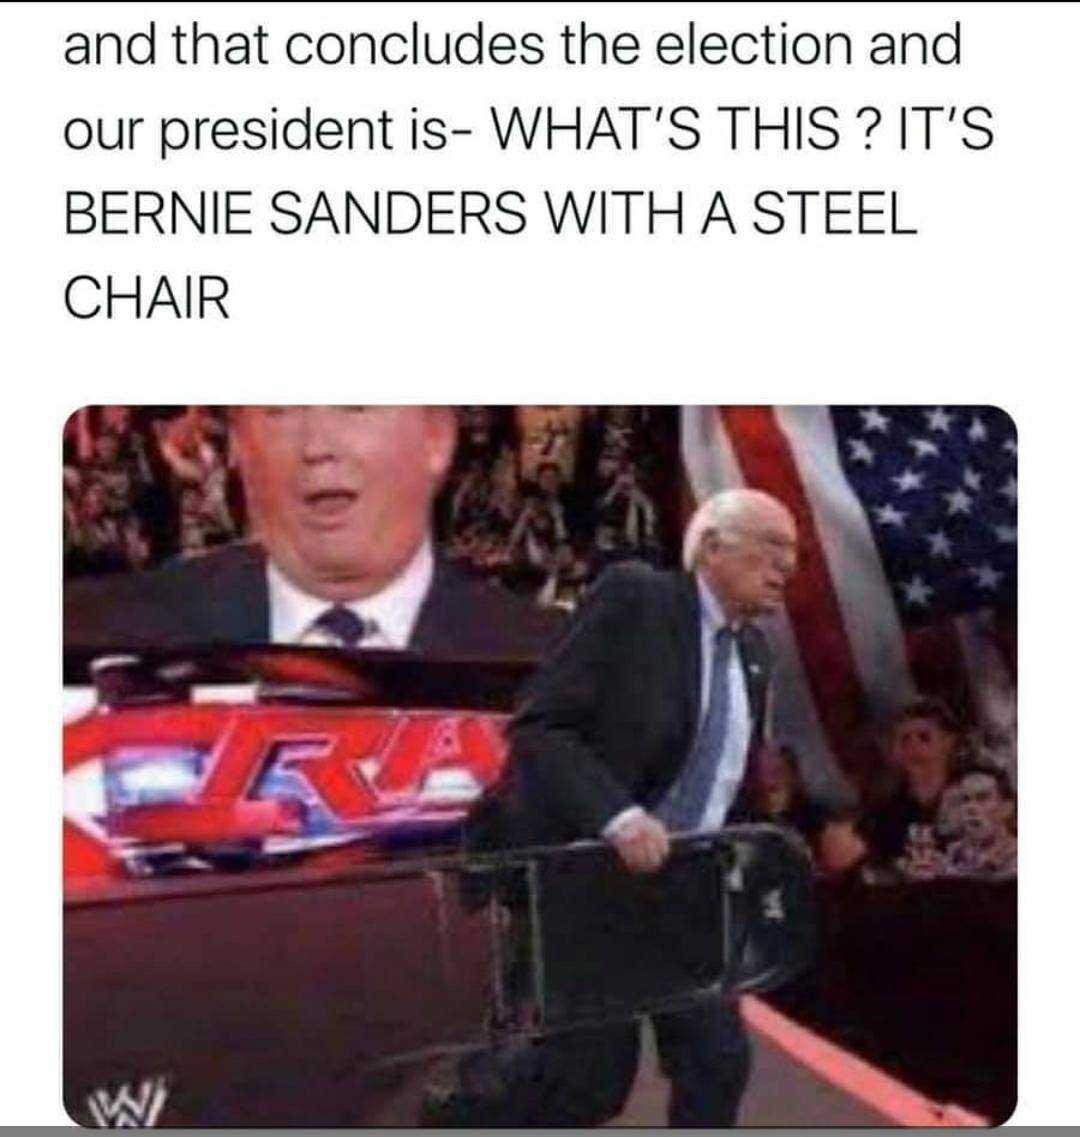 funny life meme - election meme